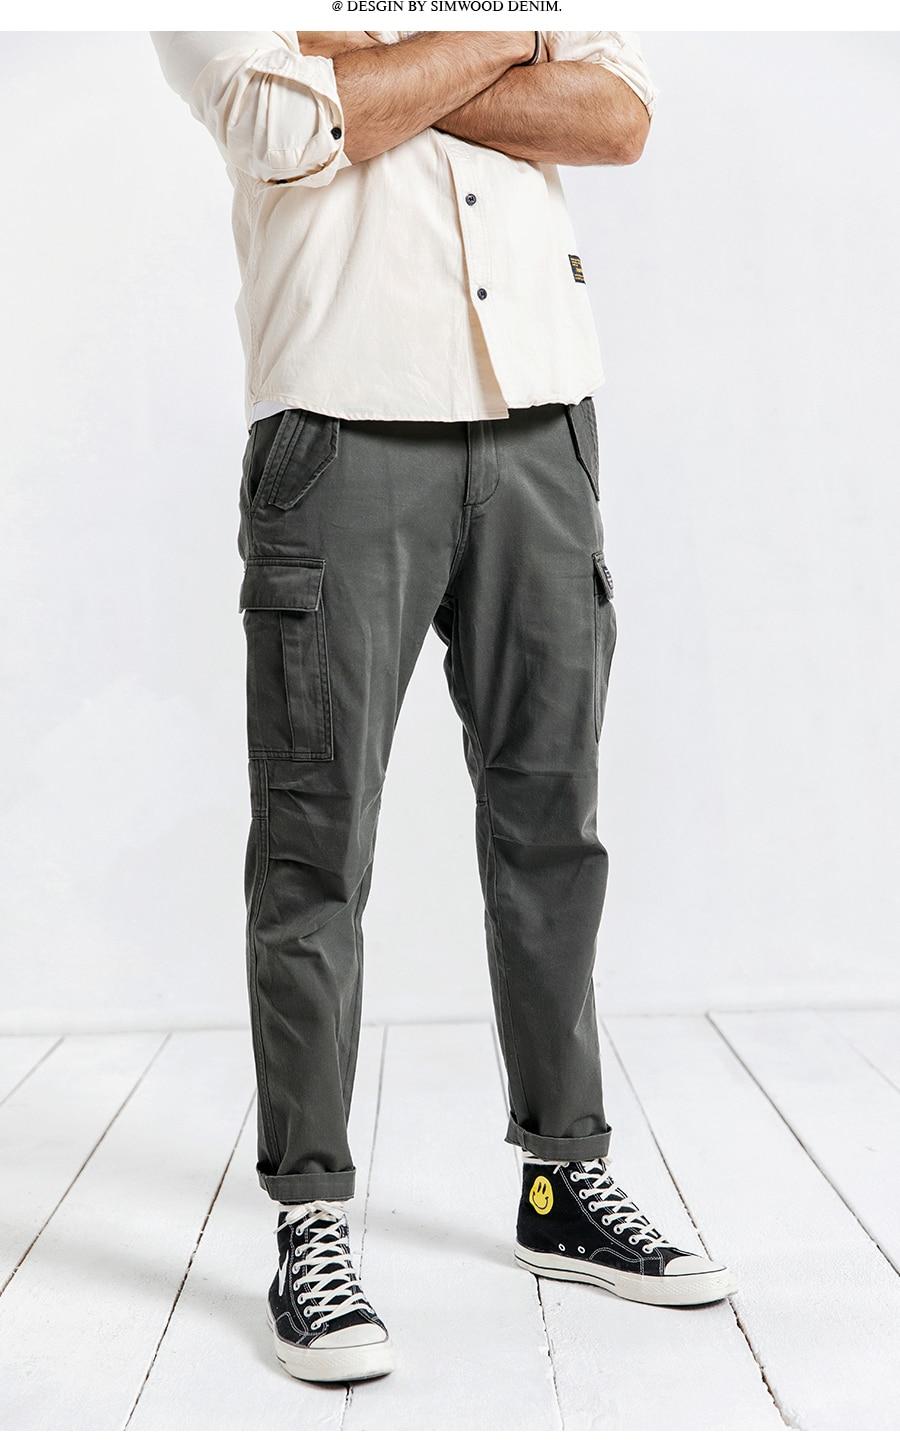 H0572cfe1e9bf425b9f2065a5ee681e14k SIMWOOD New 2019 Casual Pants Men Fashion track Cargo Pants Ankle-Length military autumn Trousers Men pantalon hombre 180614